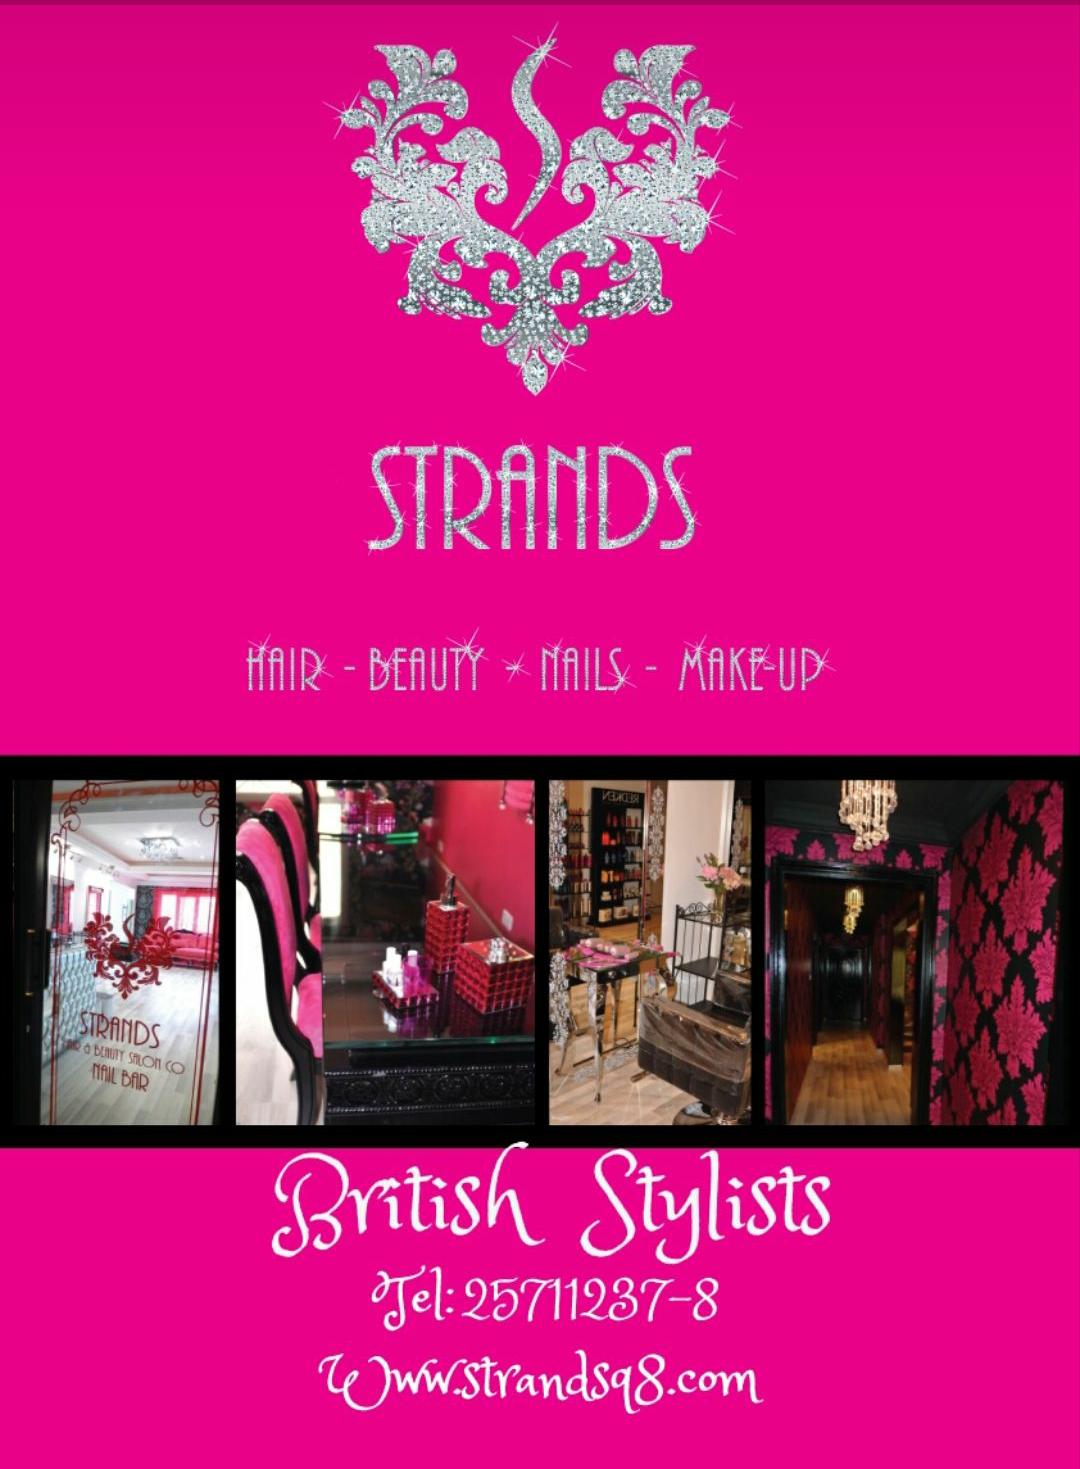 Strands Tel. 25711237